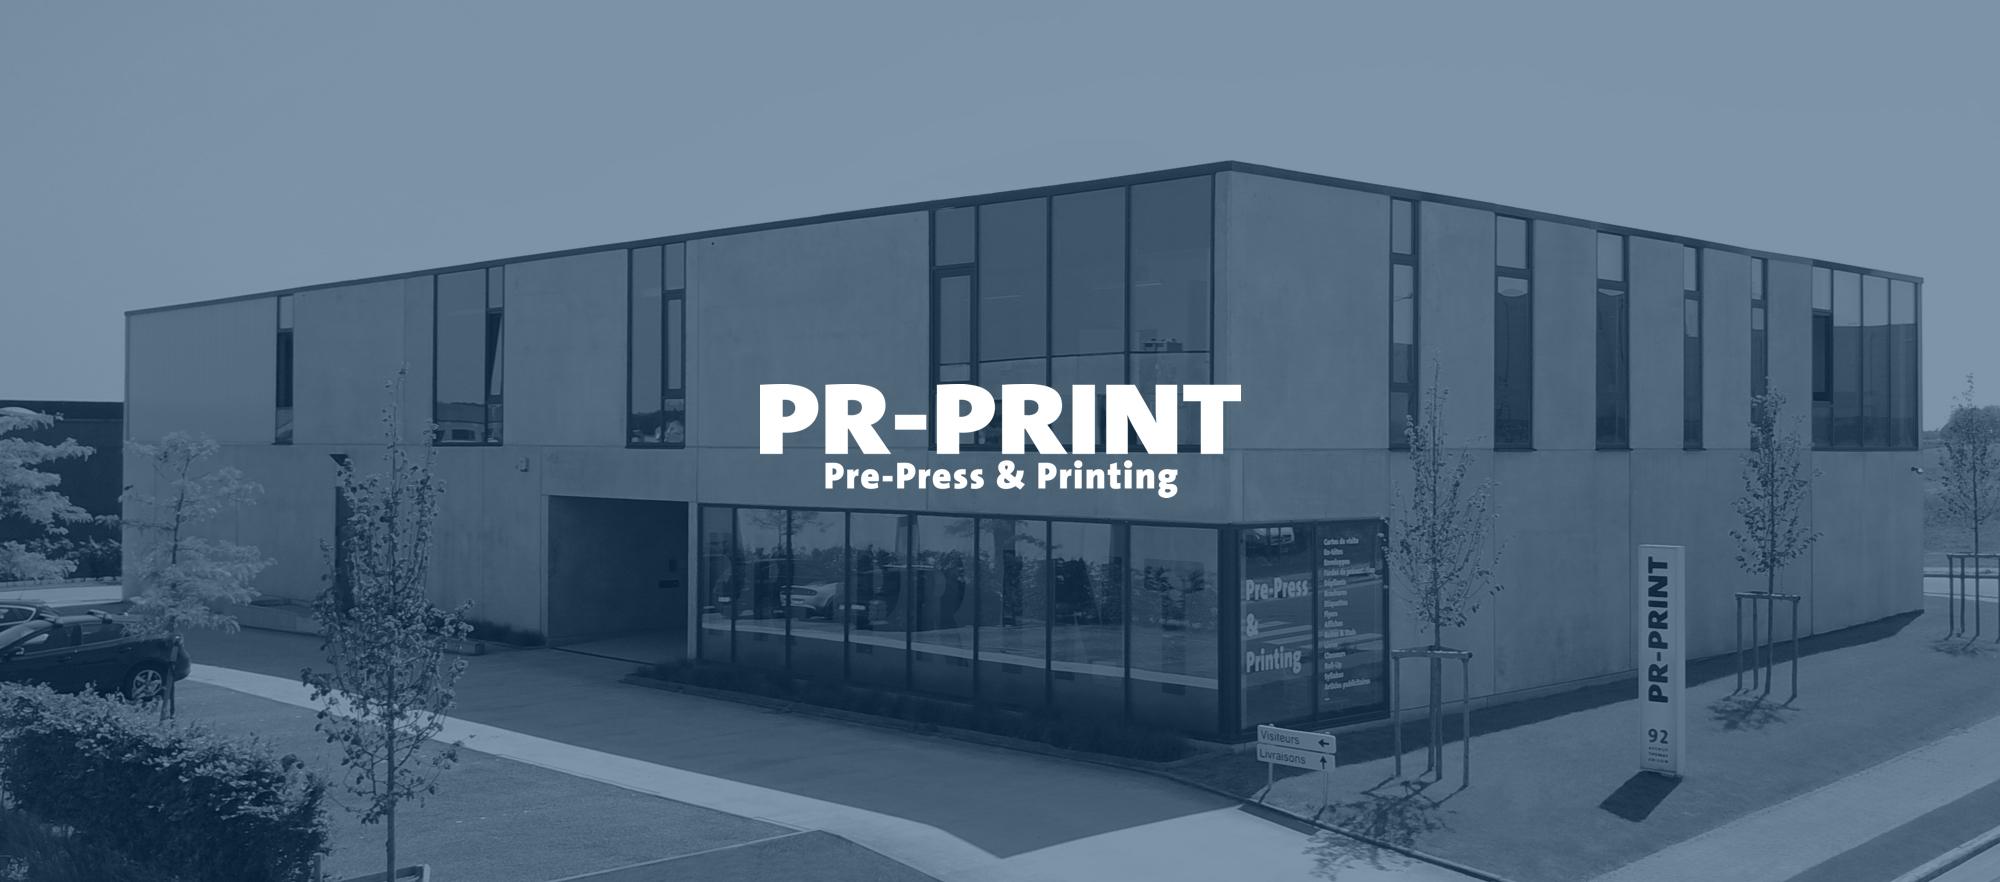 PR-PRINT - Branding and Website Design and Development - KERN IT